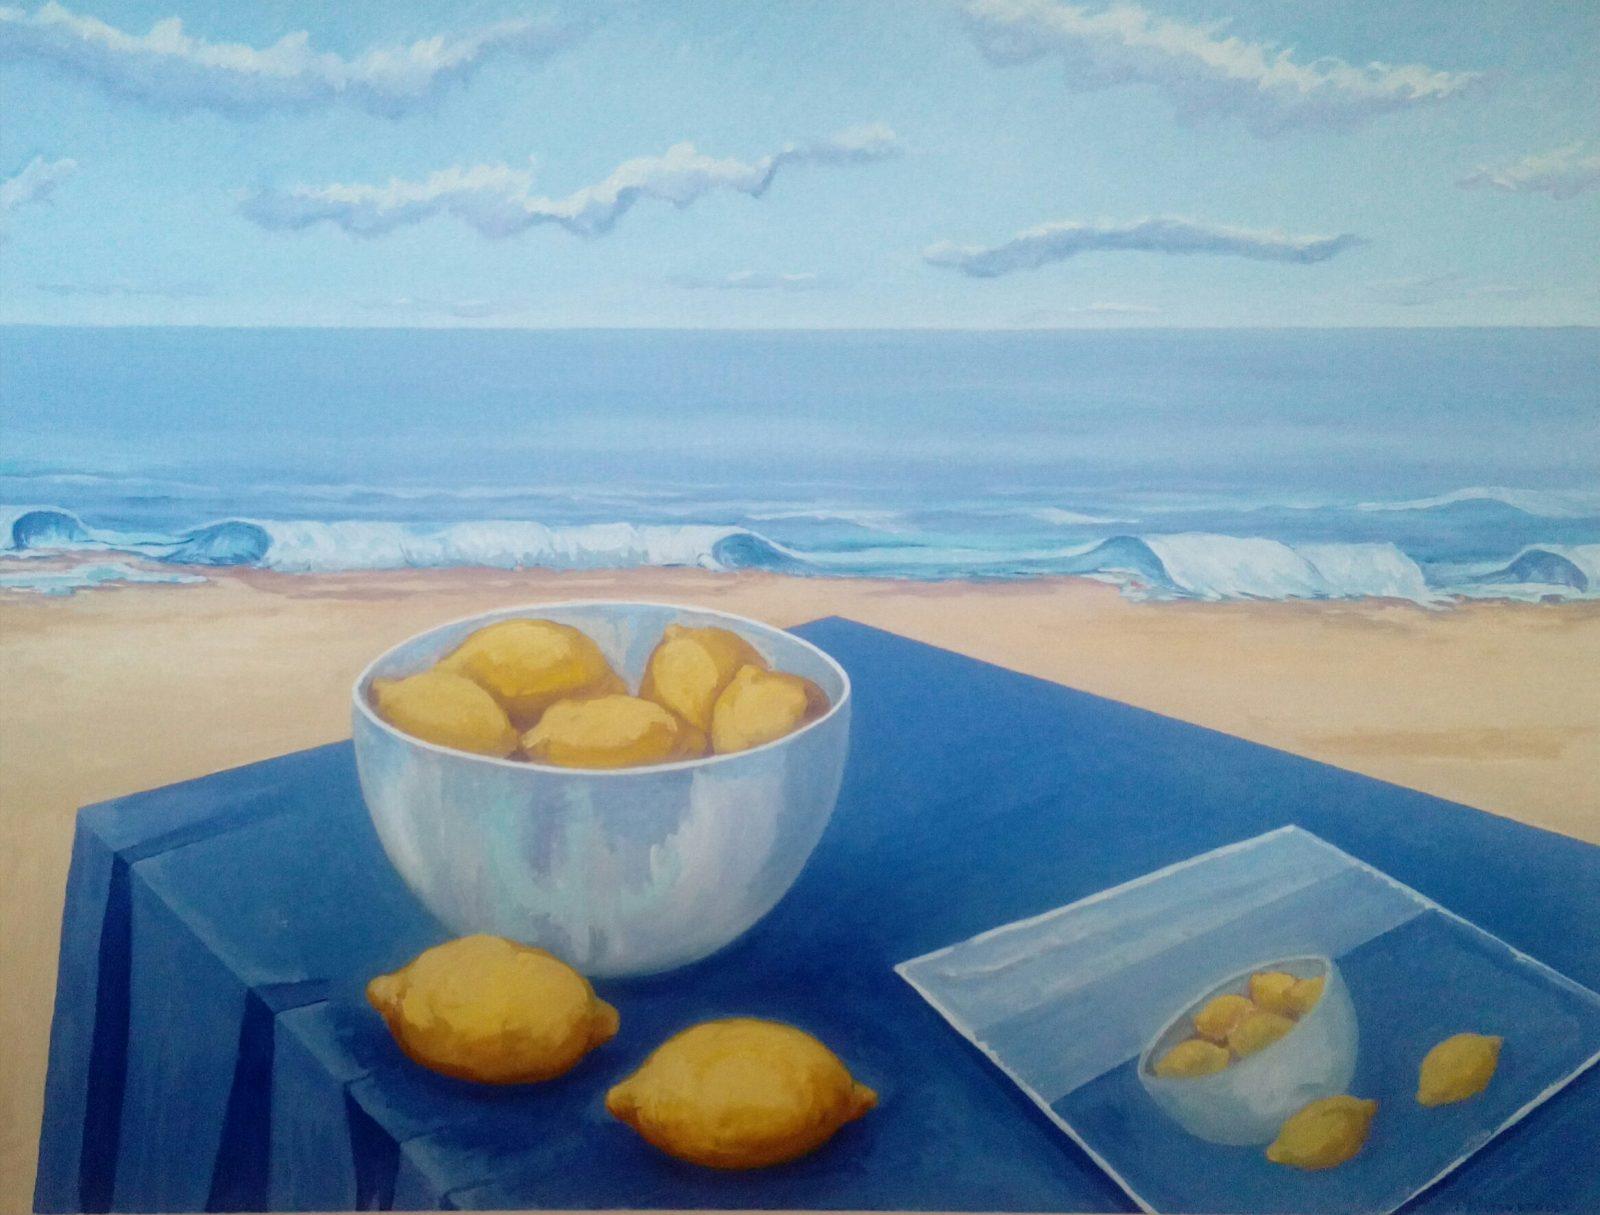 Pintando limones